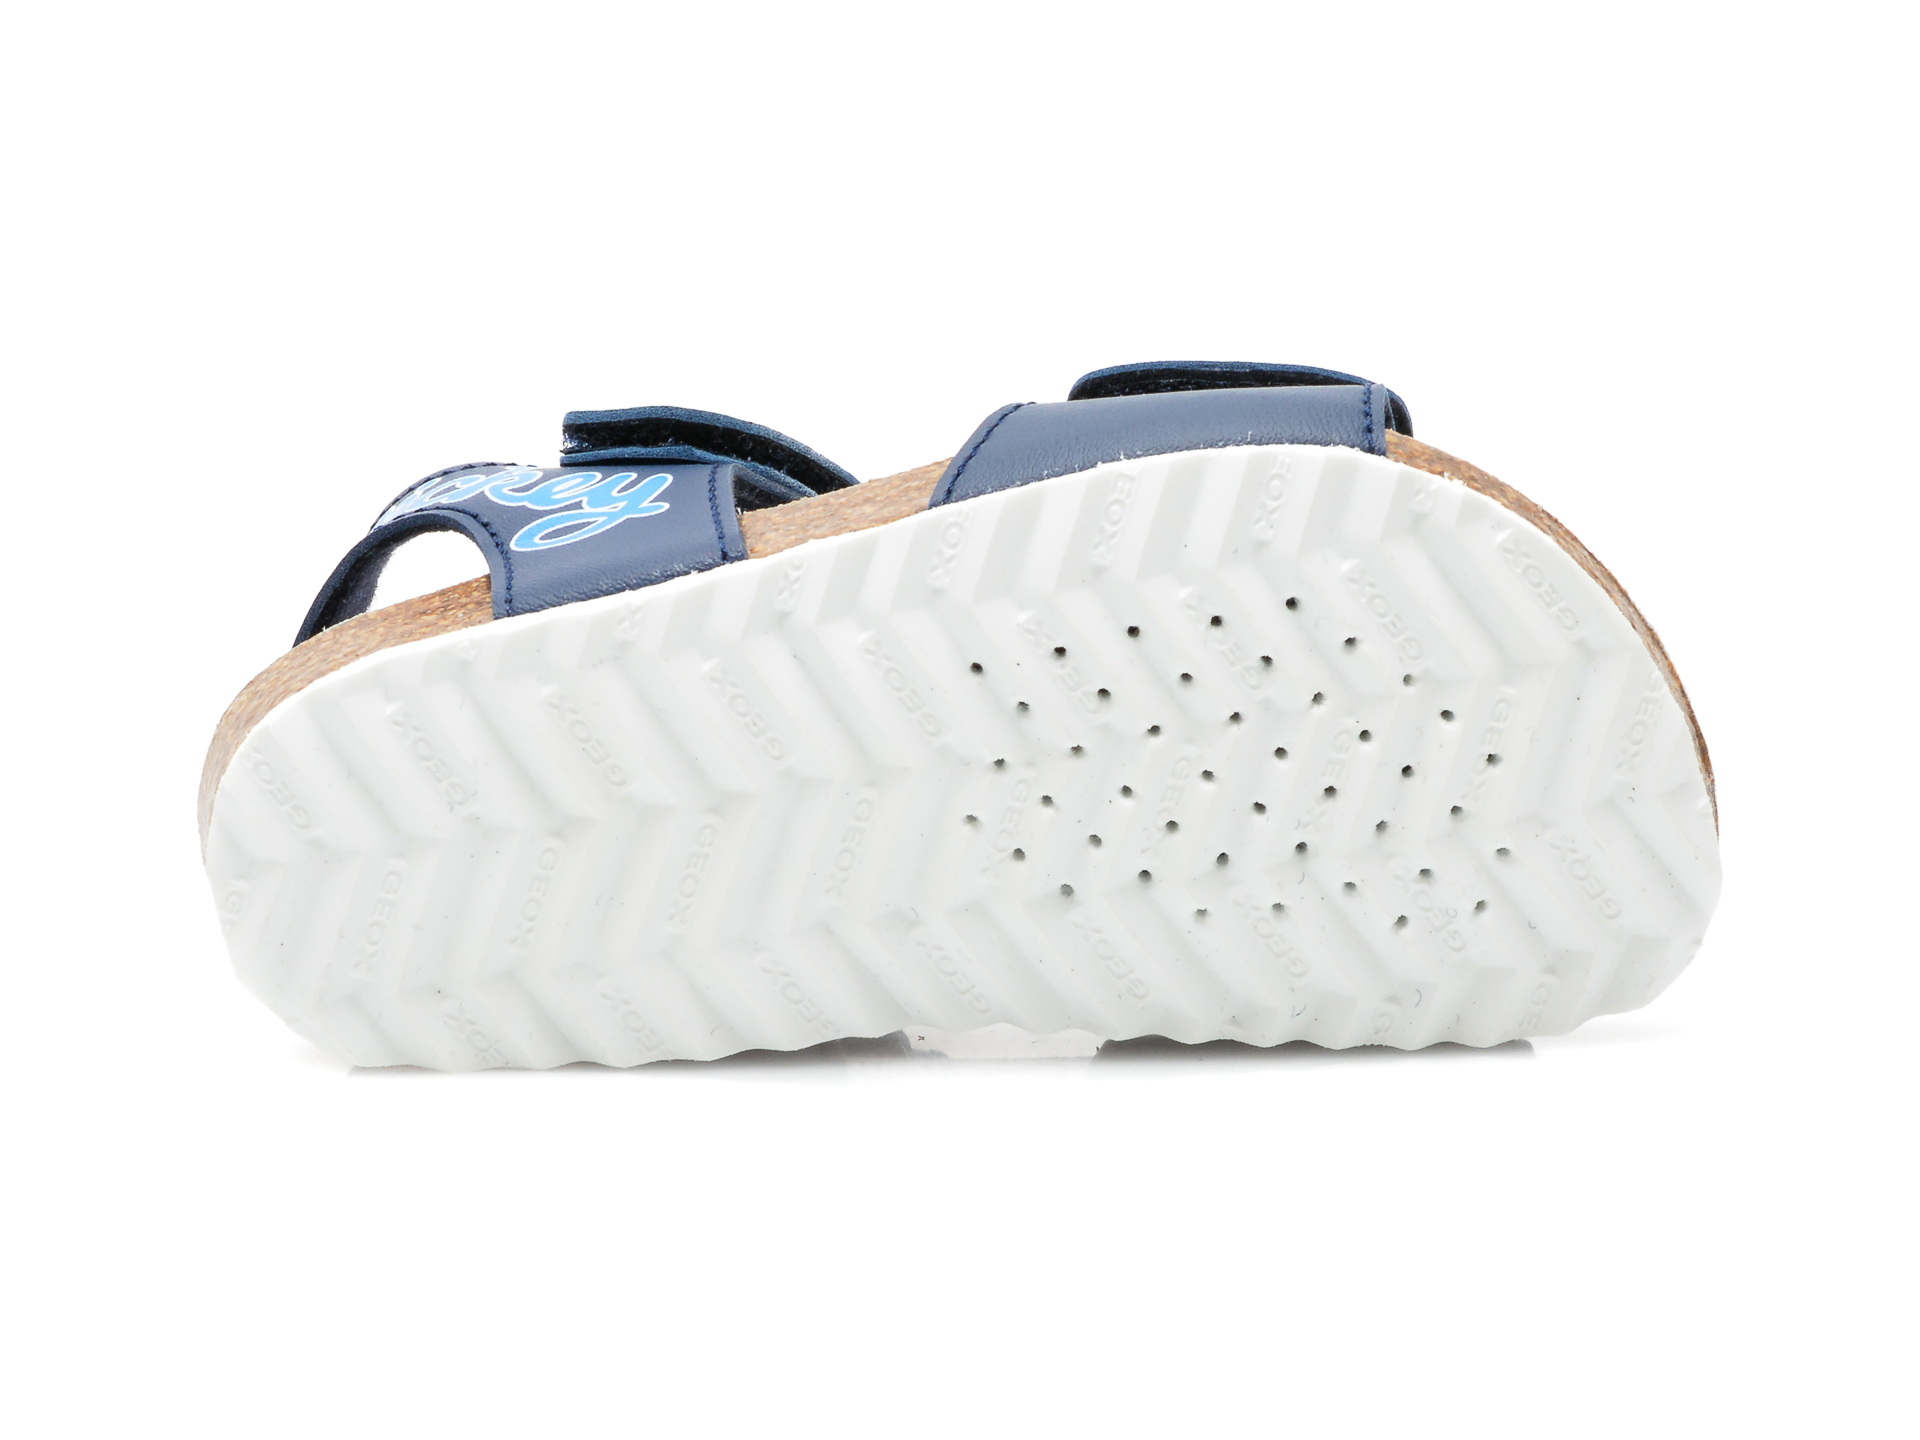 Sandale GEOX albastre, B152QC, din piele ecologica - 7